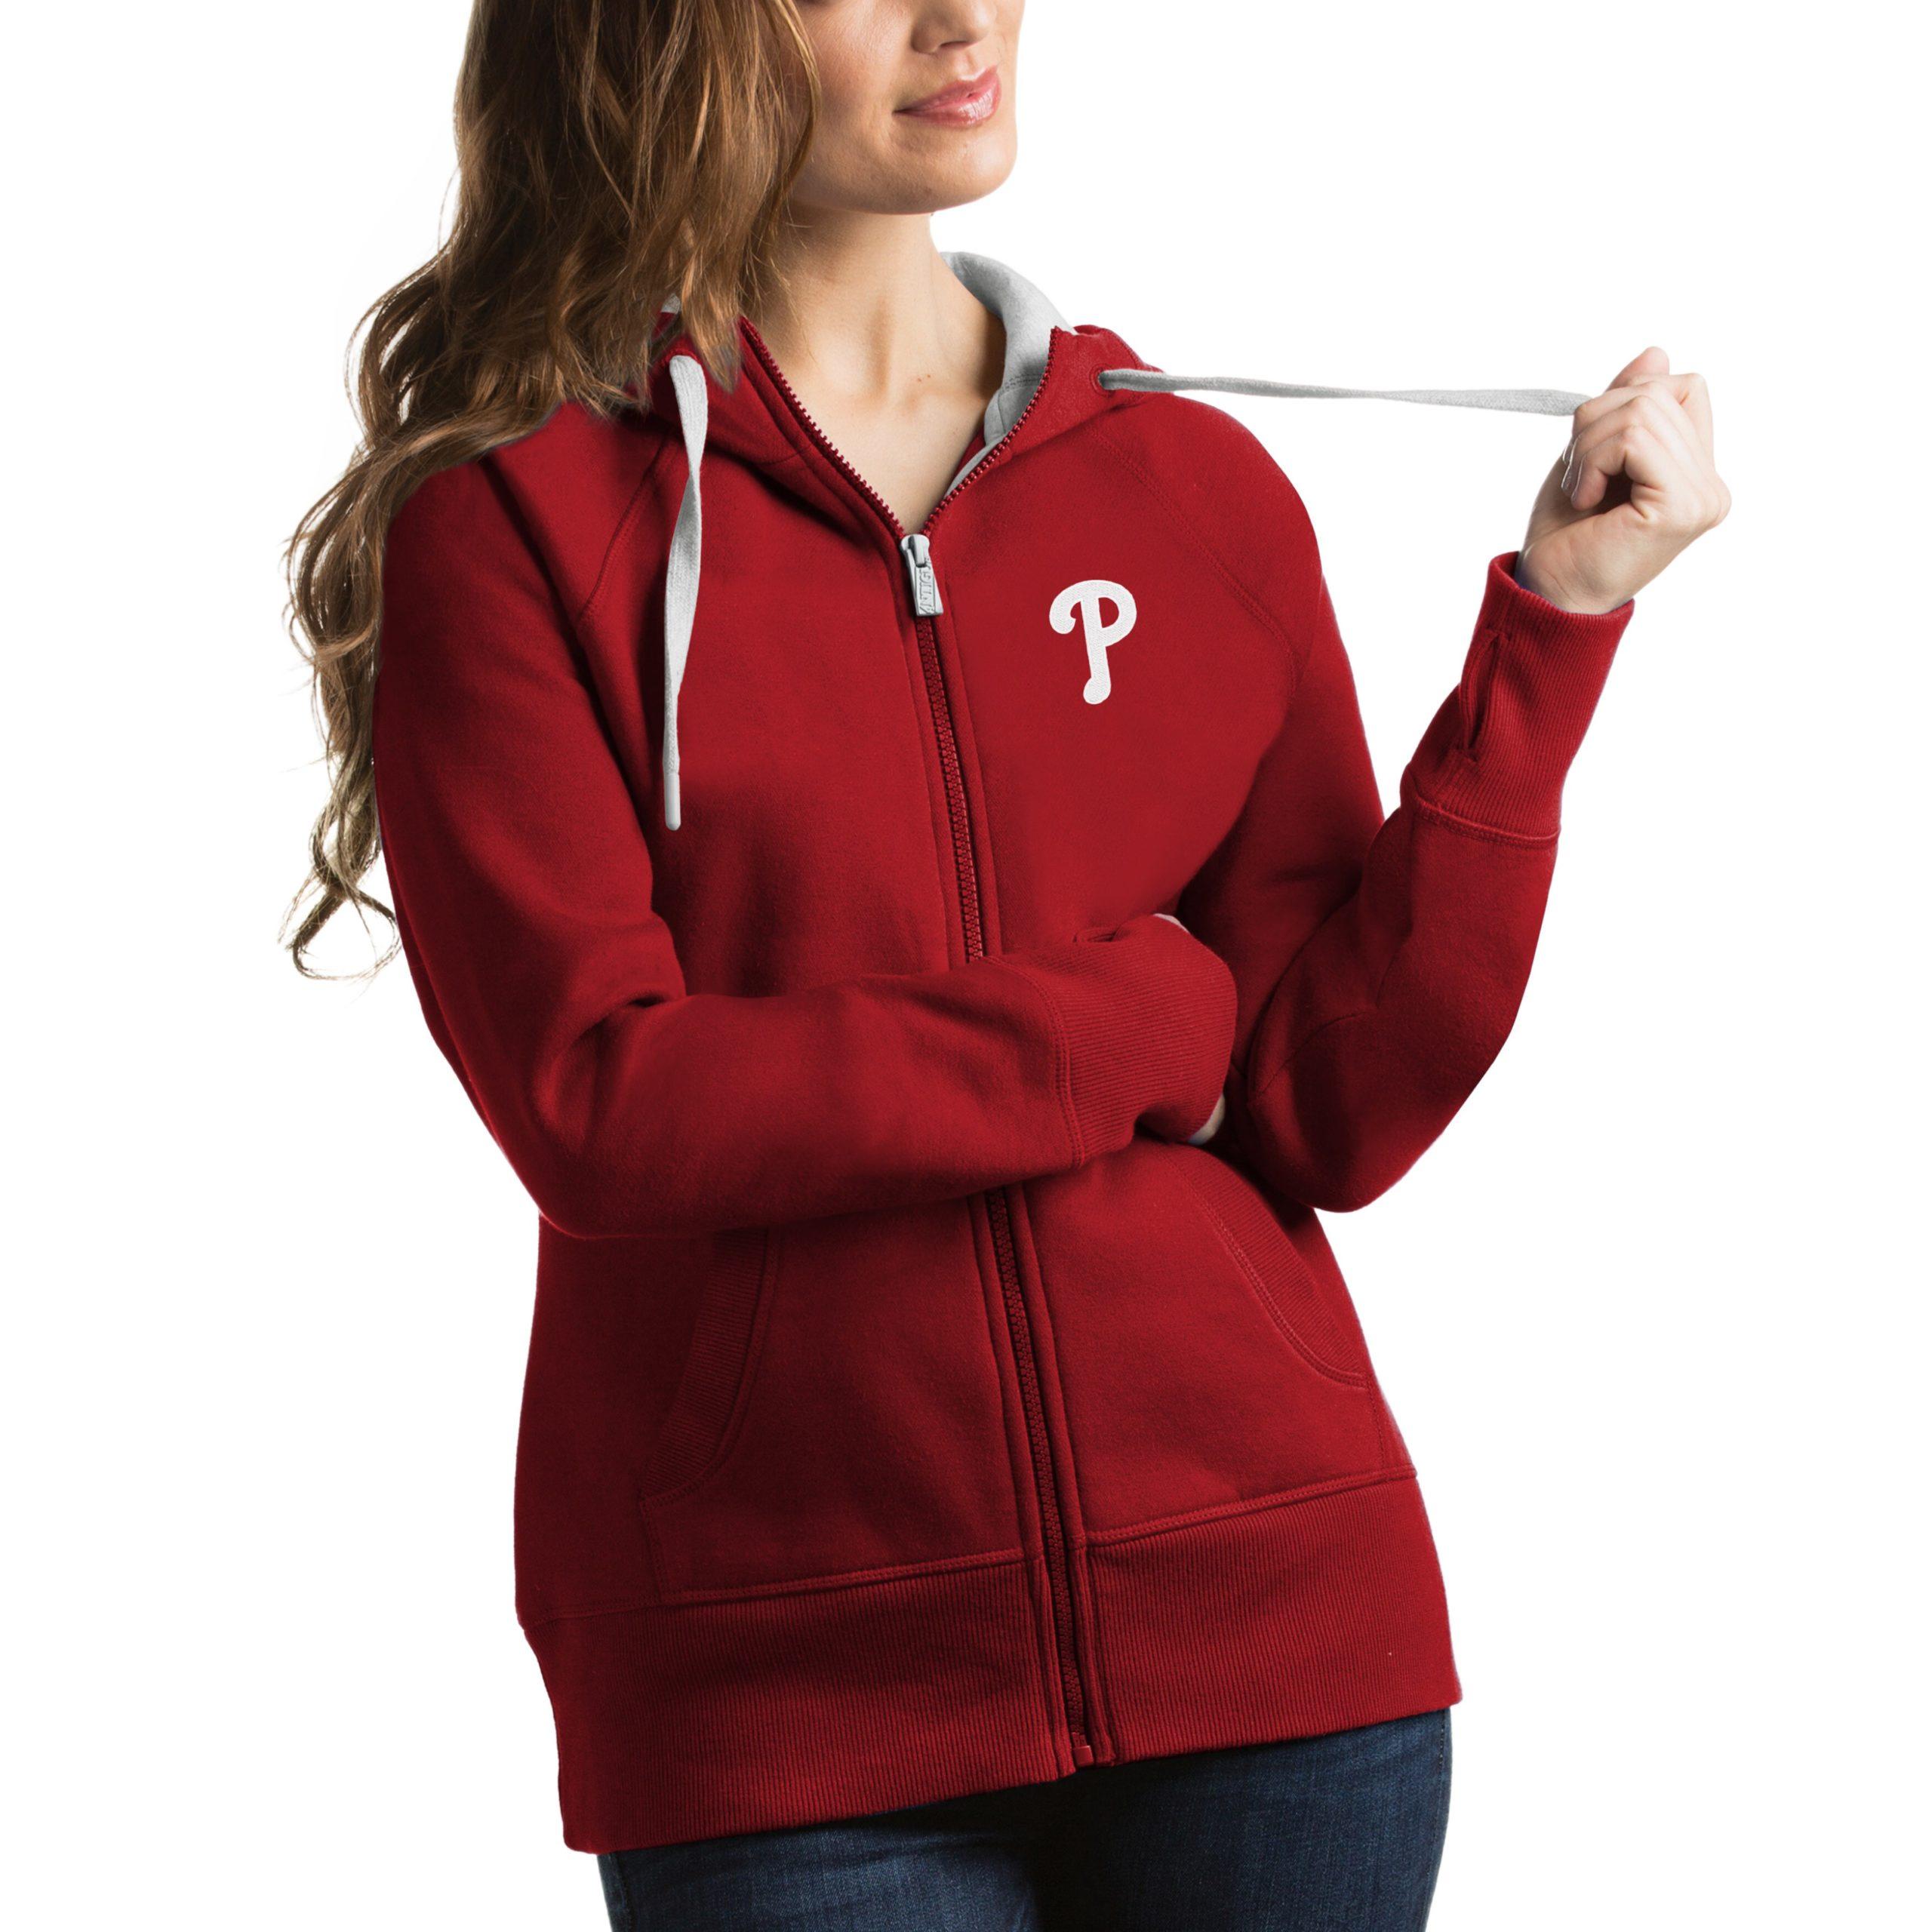 Philadelphia Phillies Antigua Women's Victory Full-Zip Hoodie - Red